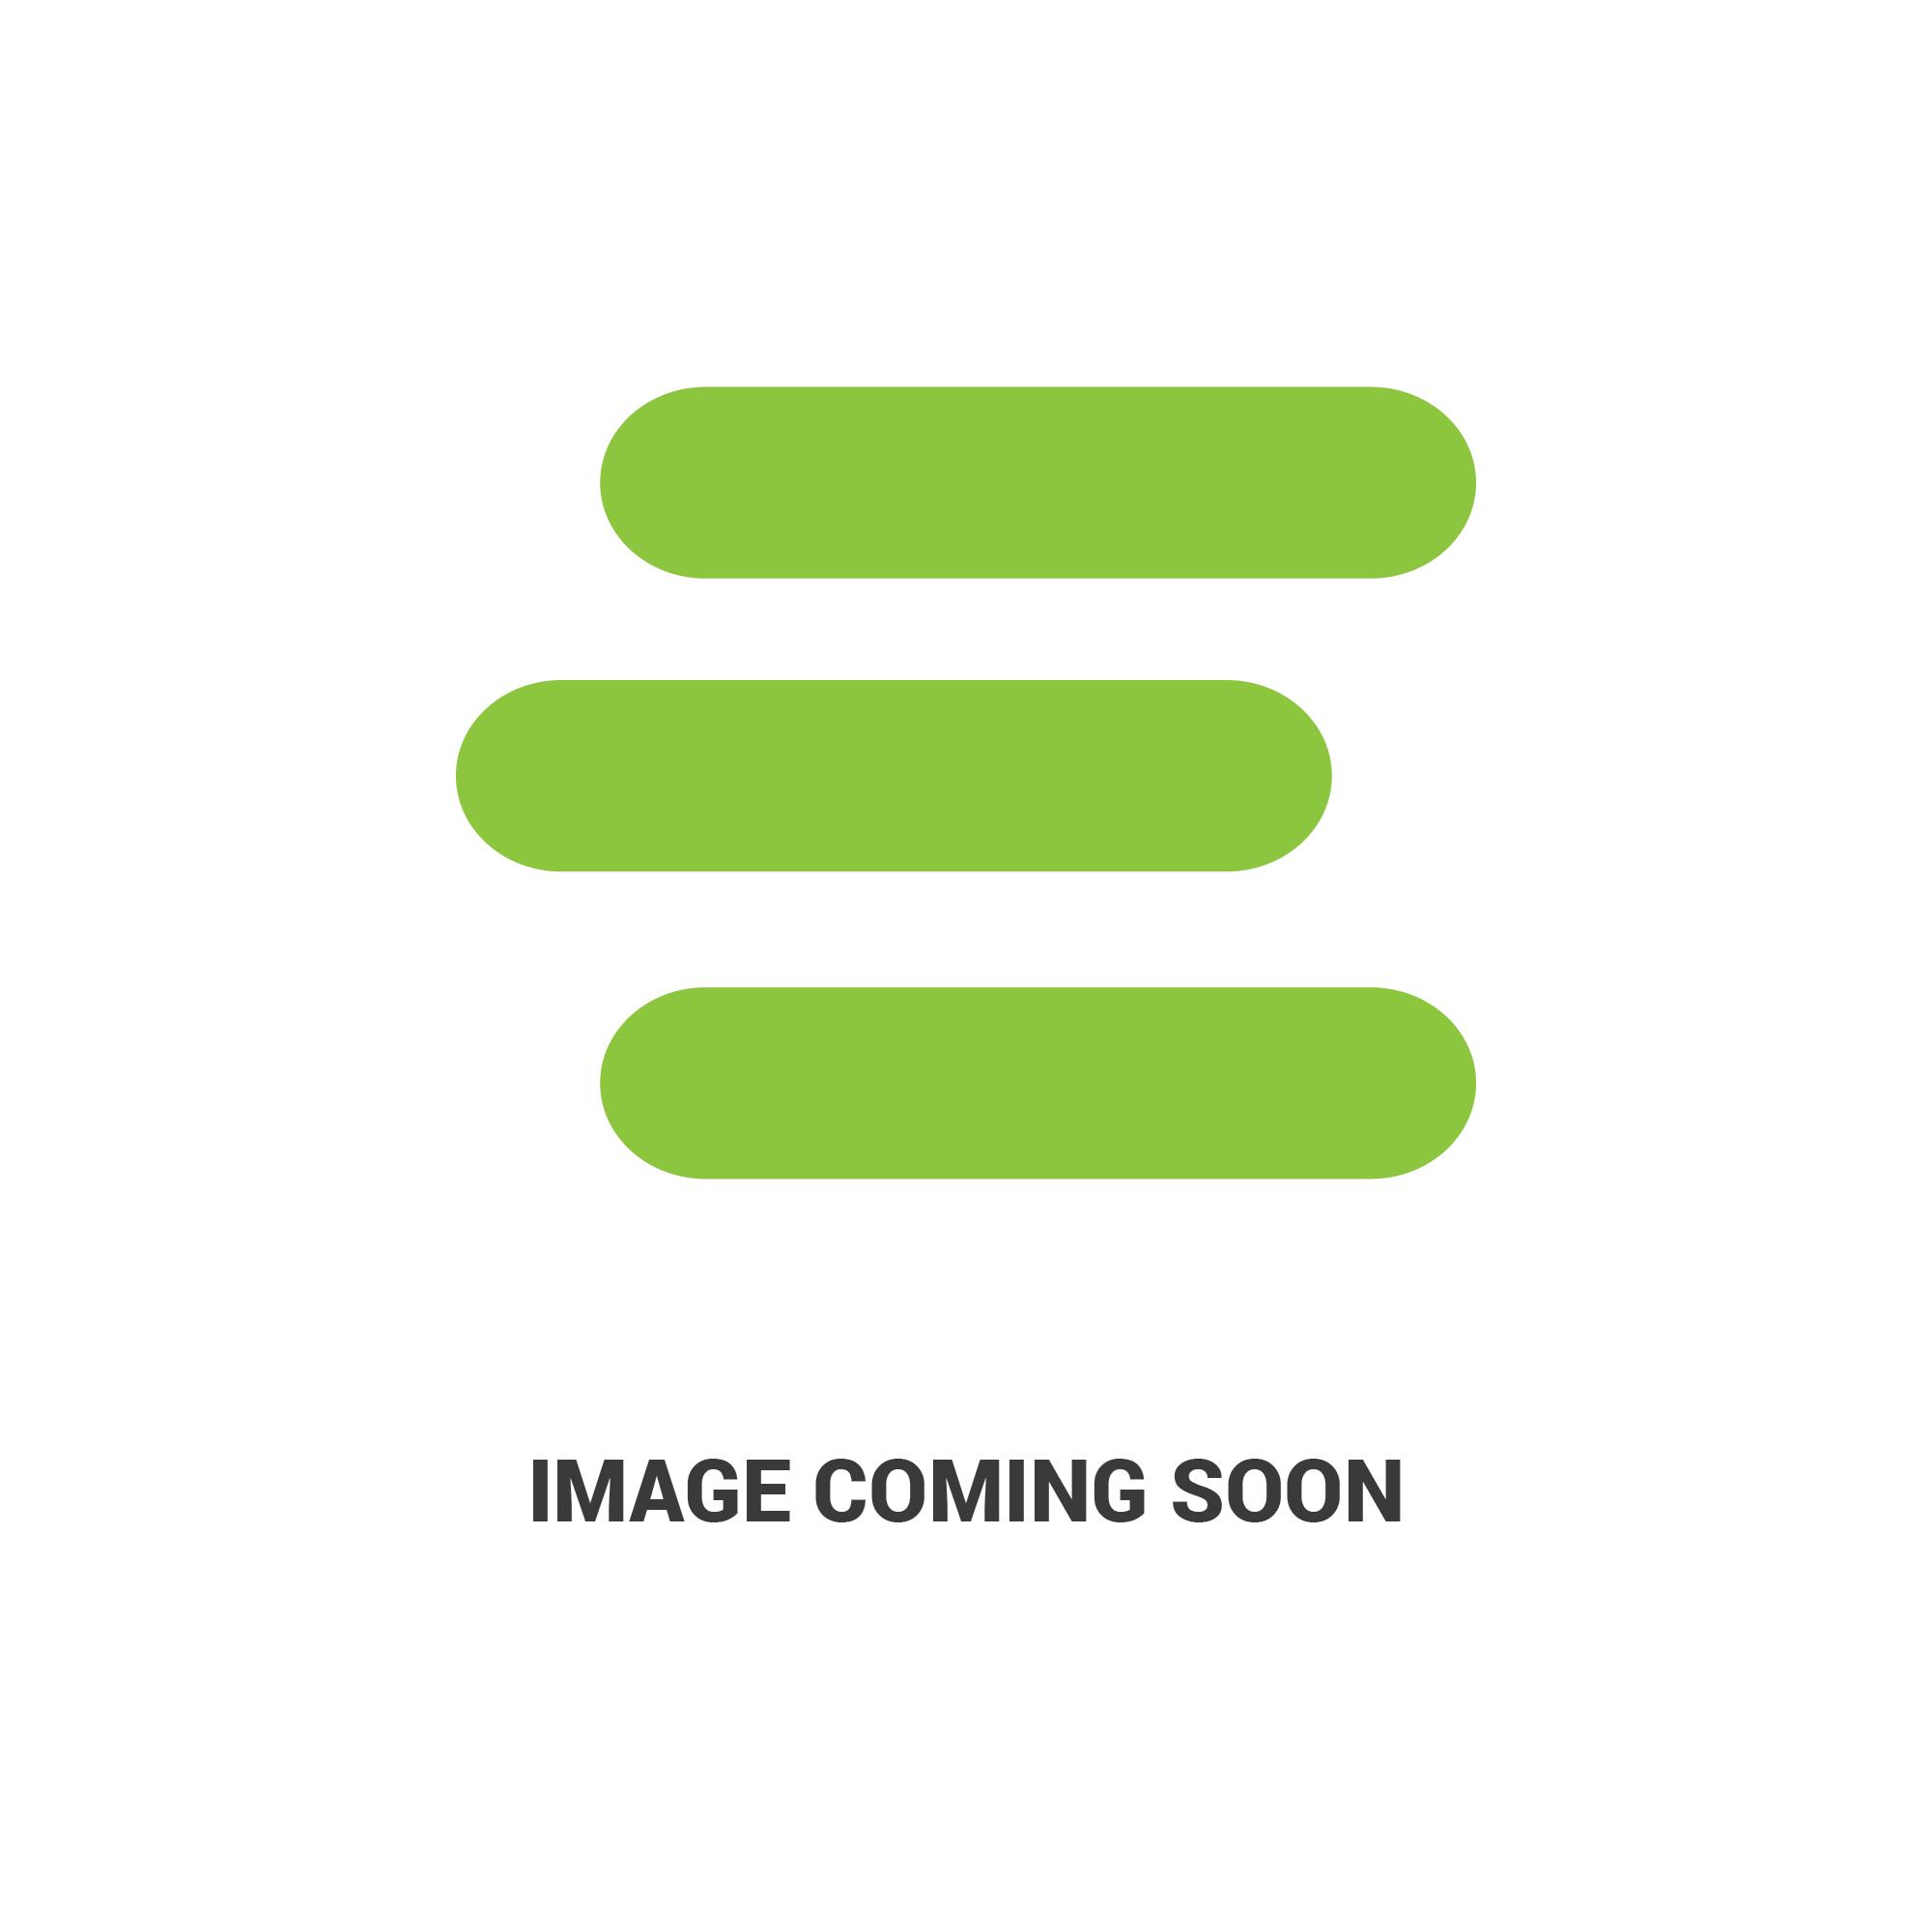 E-6718260edit 1.jpg